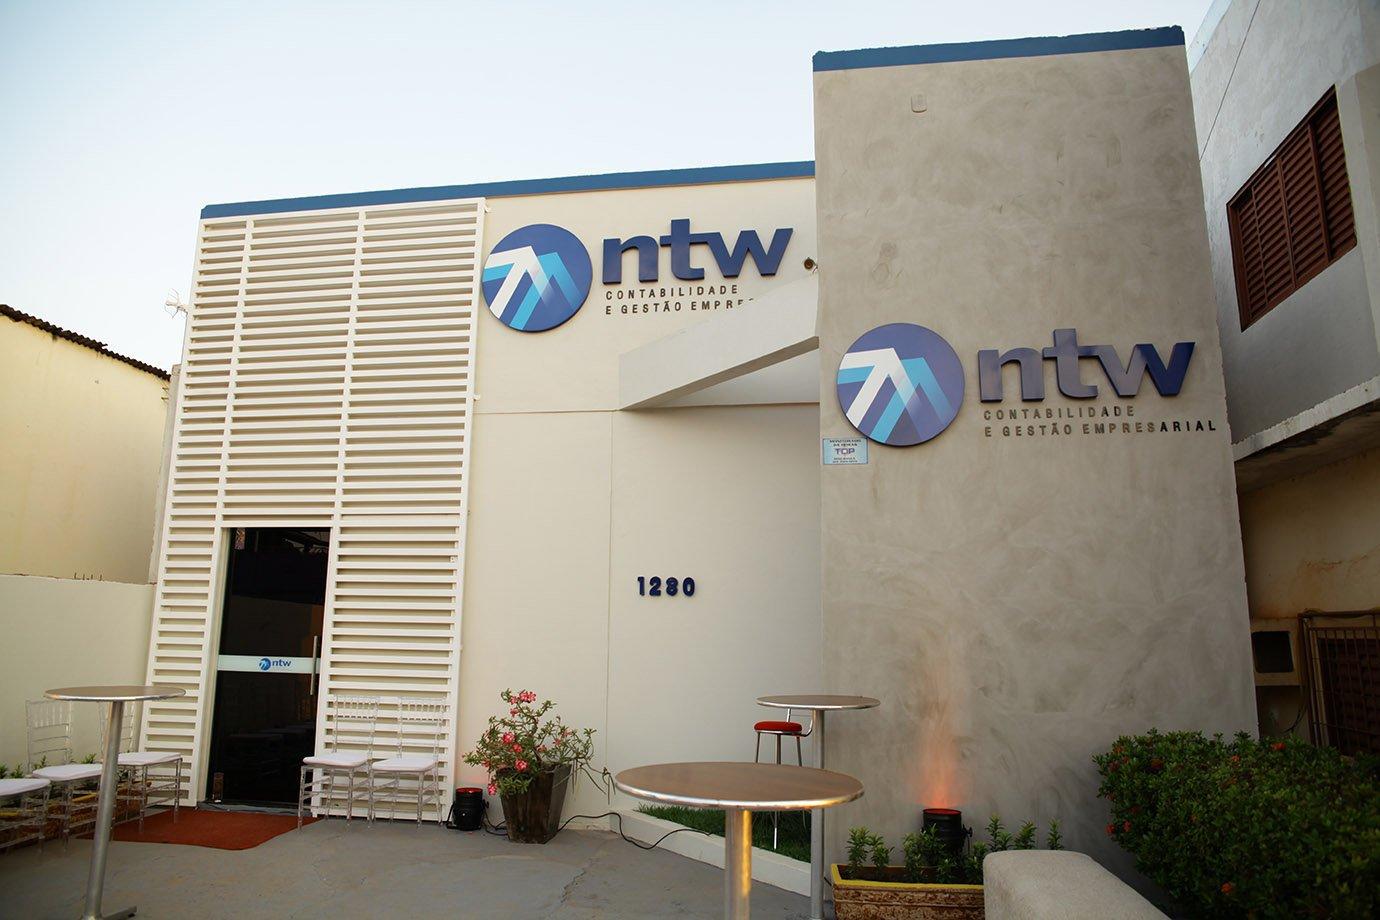 NTW Contabilidade